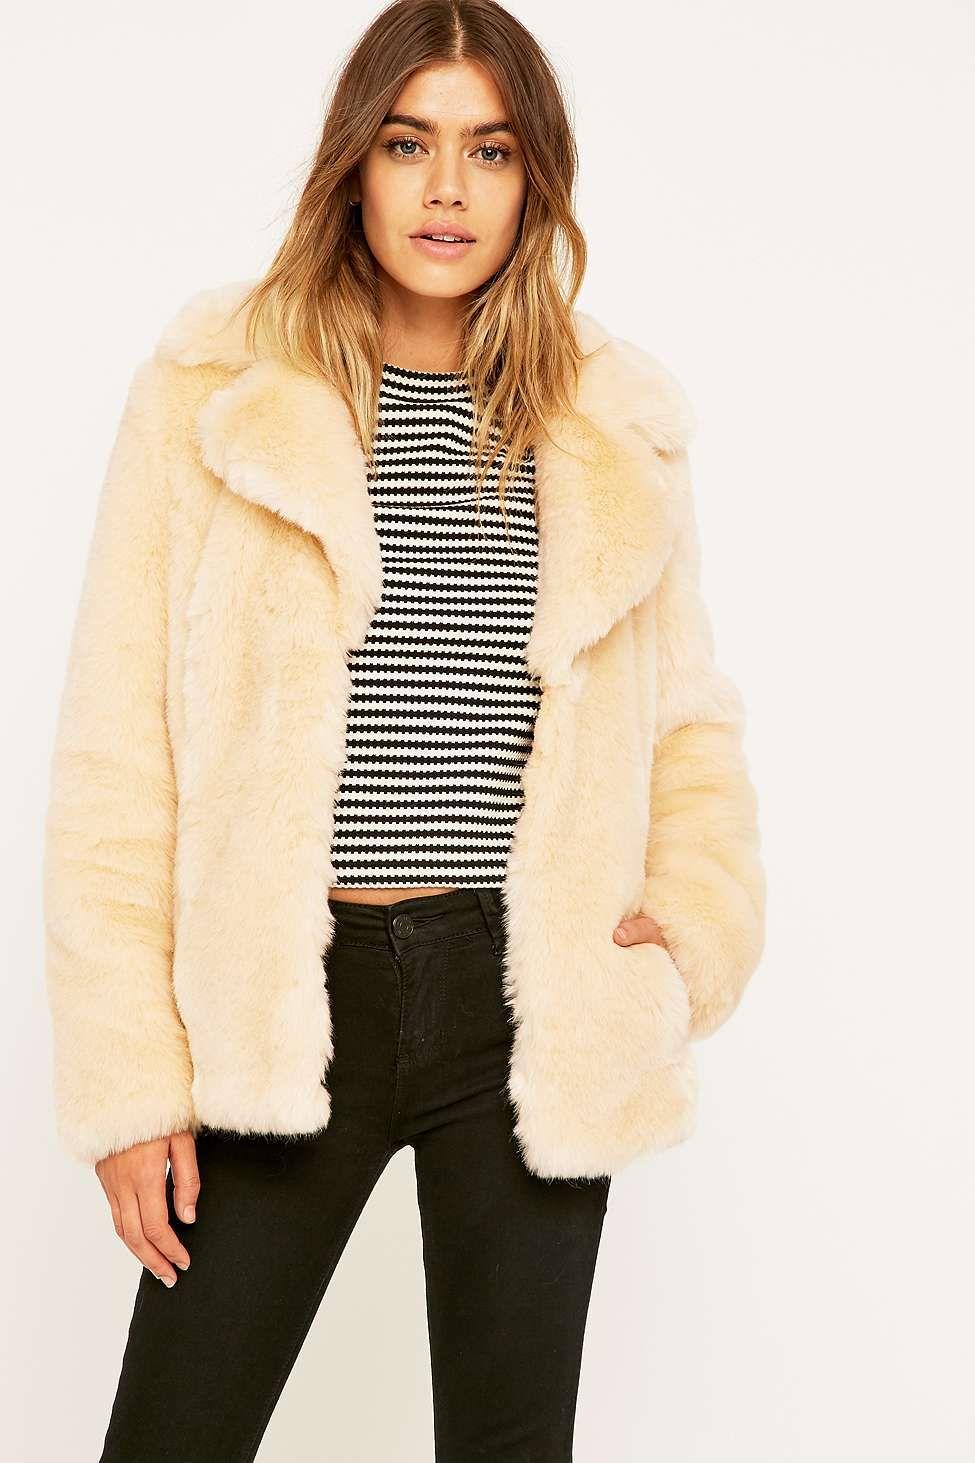 Jakke Charlie Cream Coat